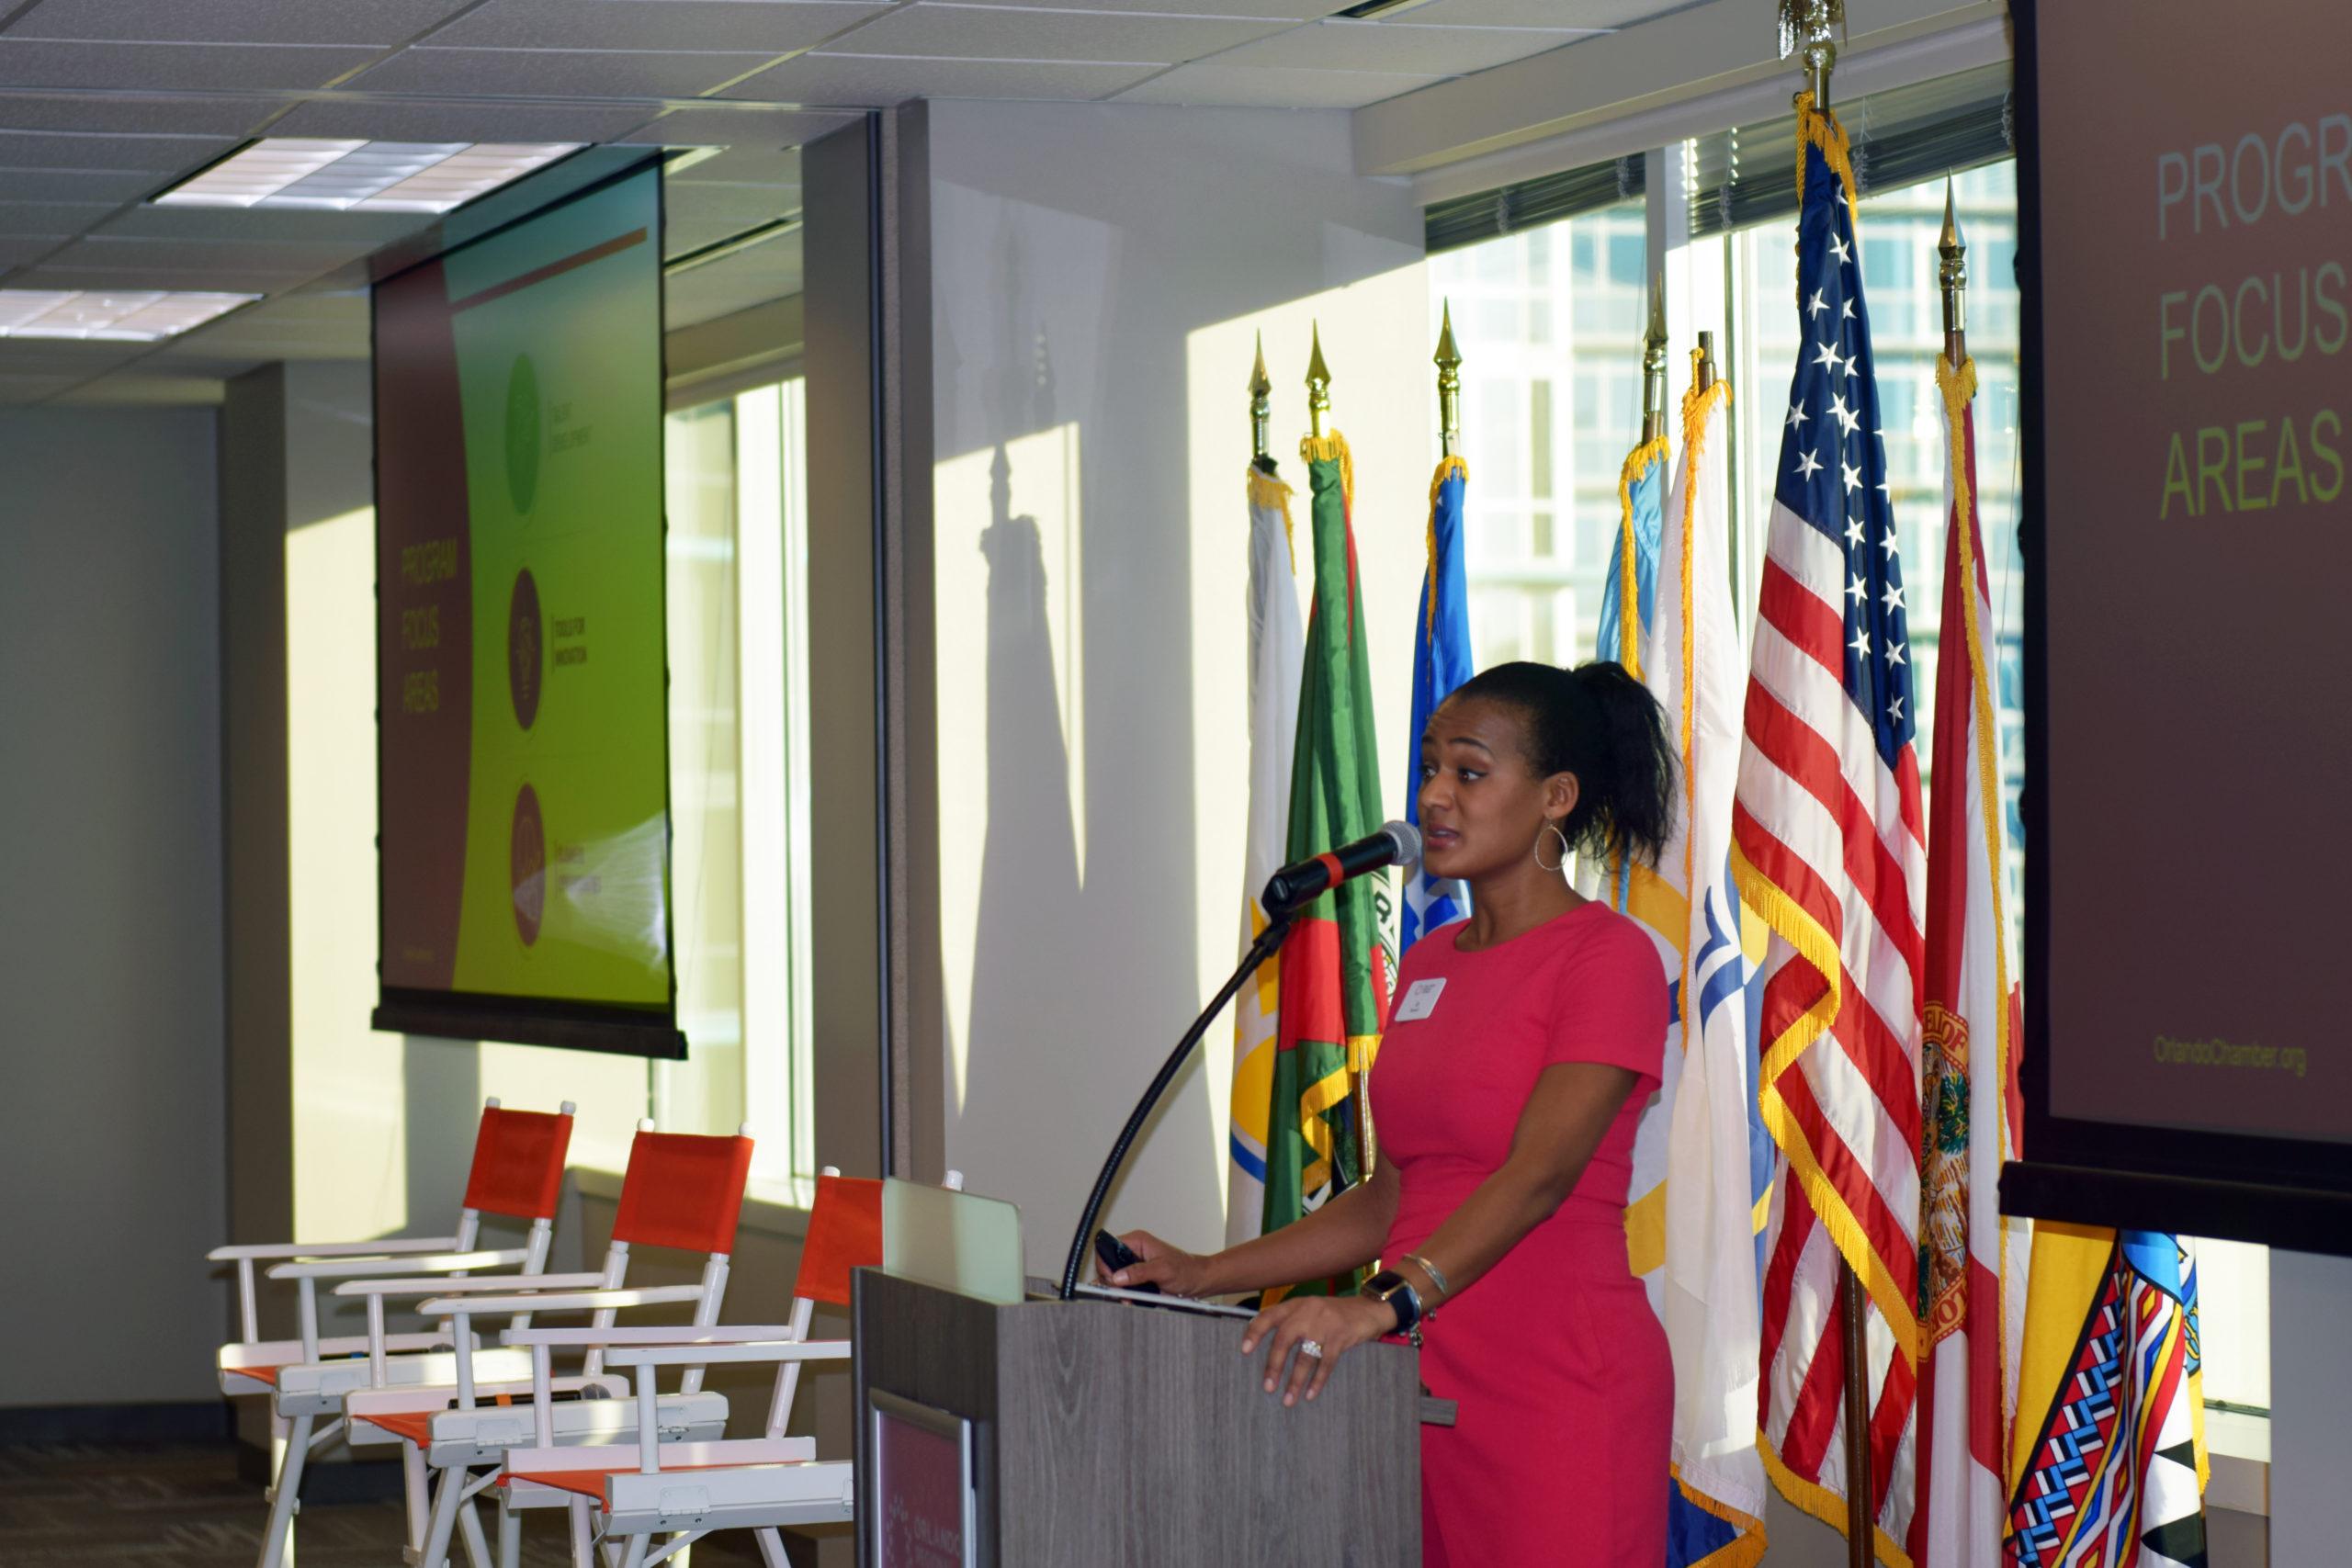 Vice President of the Orlando Regional Chamber Jo Newell